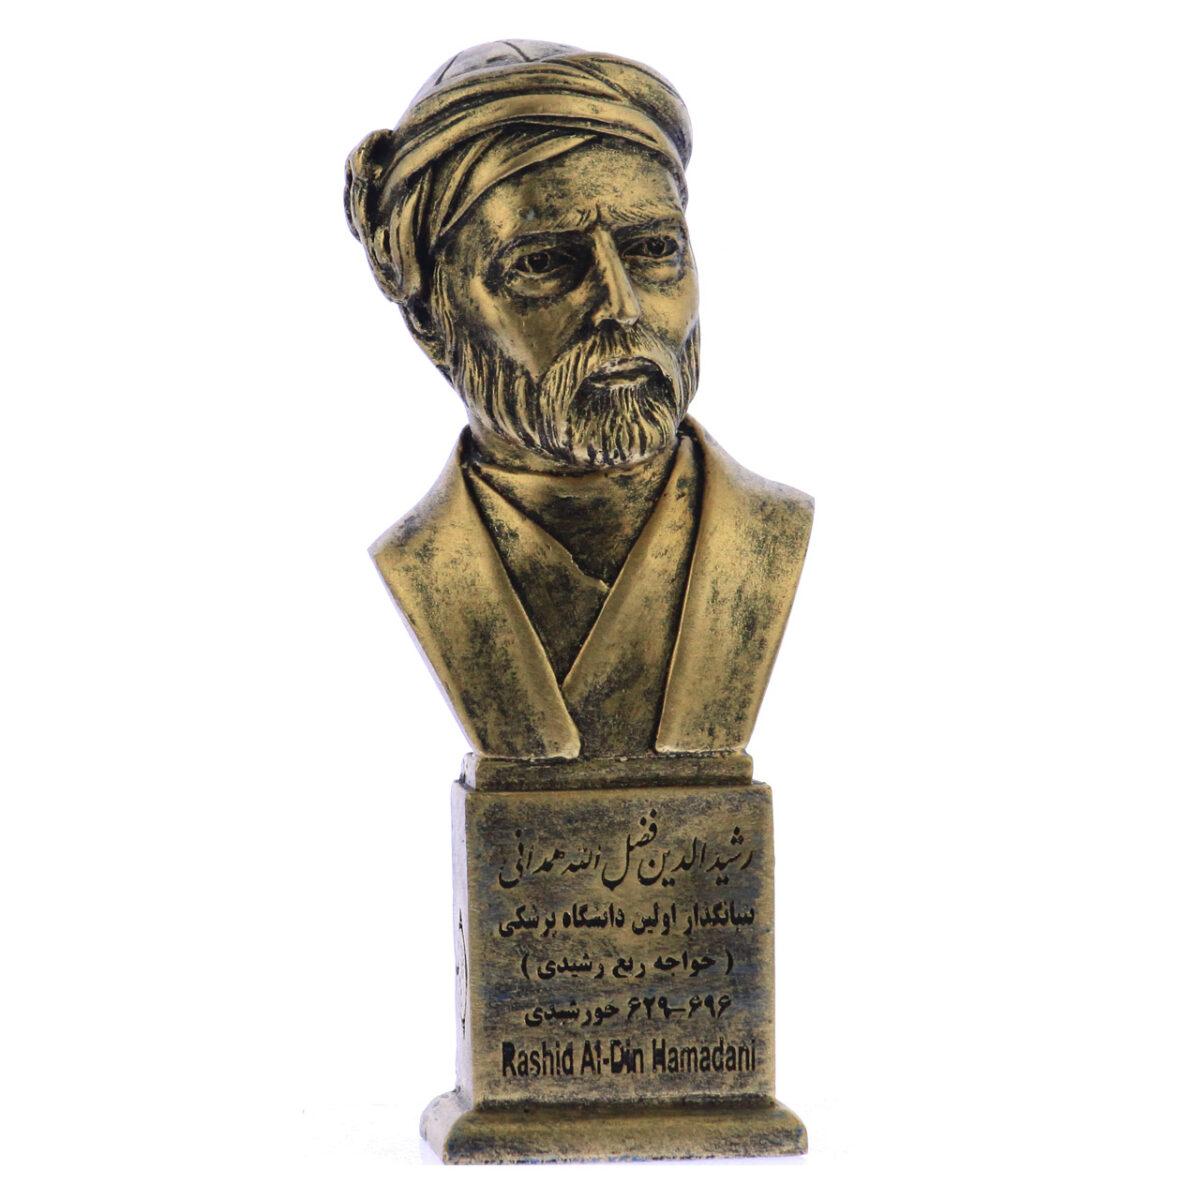 rashidodin hamedani b 1200x1200 - سردیس رشیدالدین فضل الله همدانی